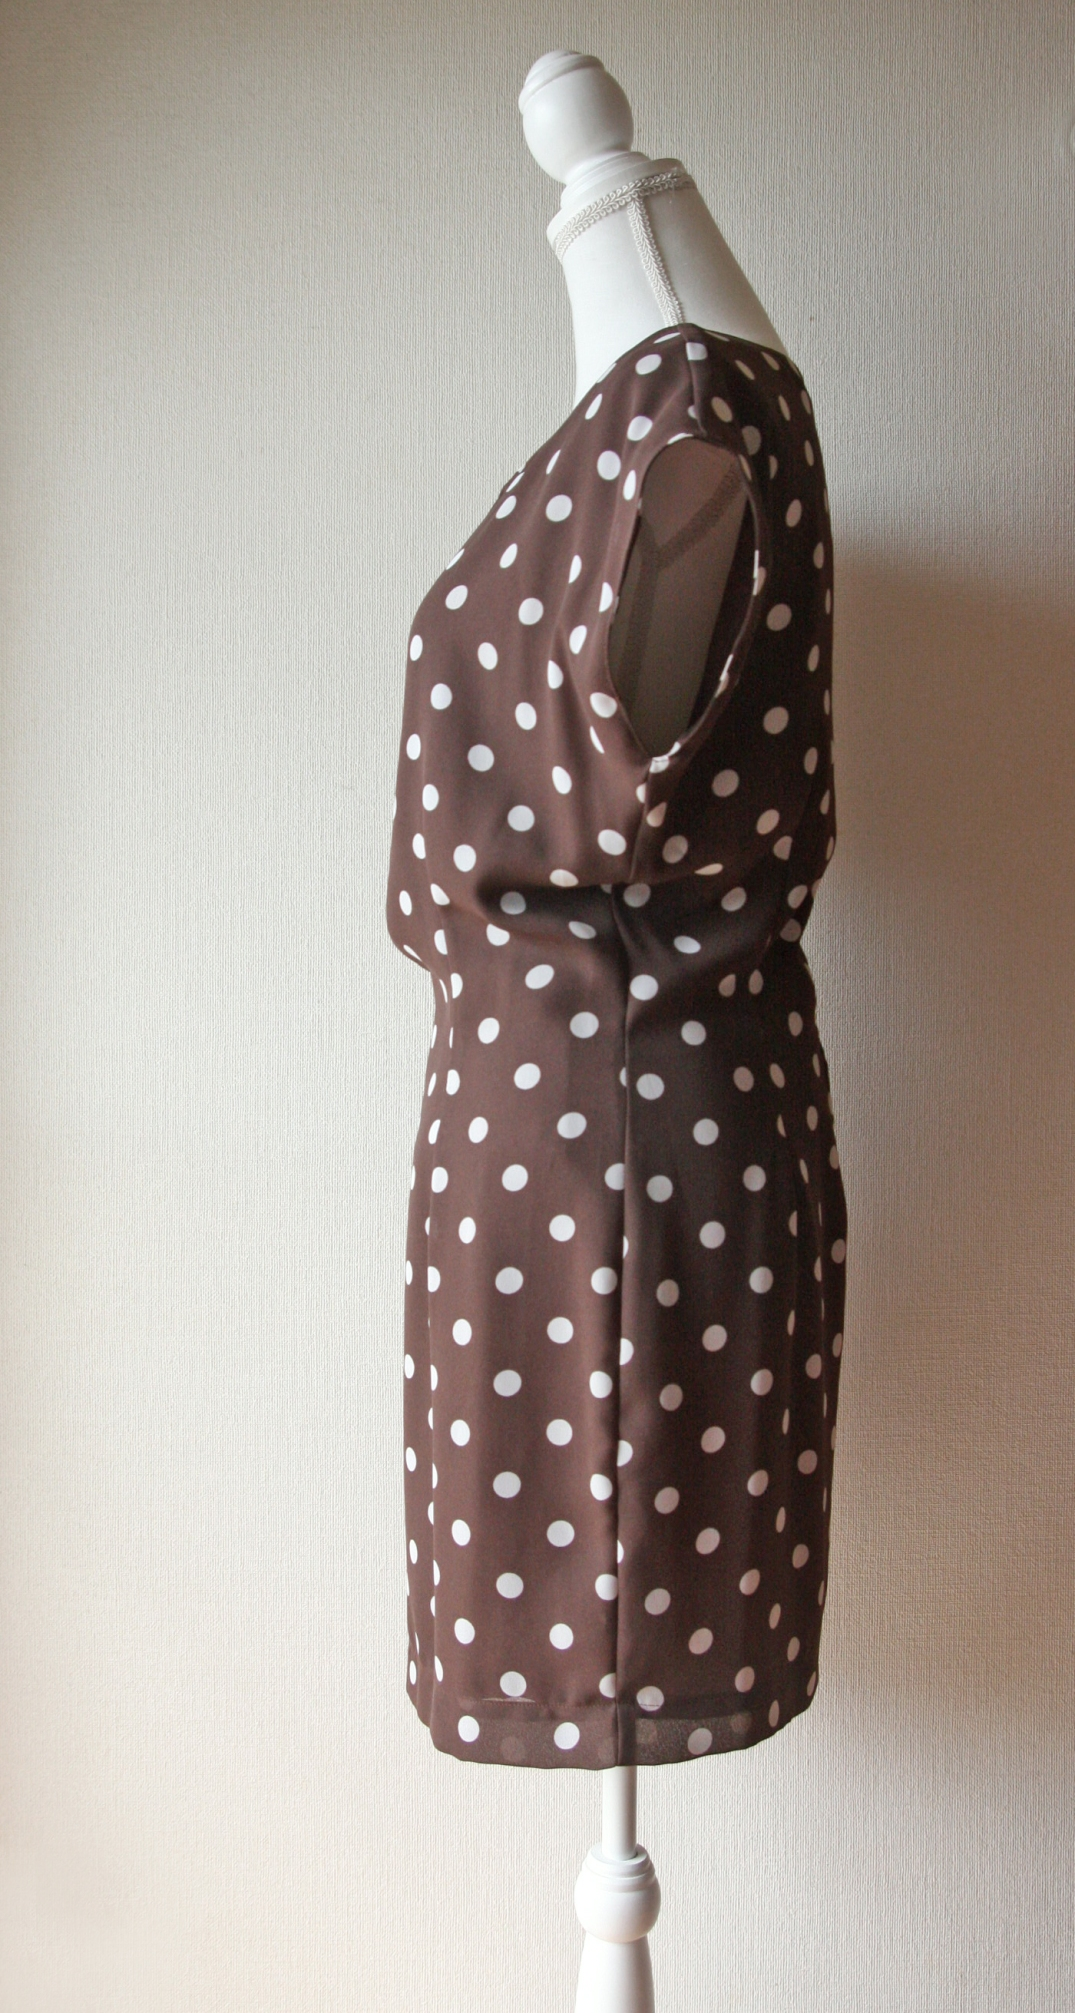 Brown Chocker Slice Top Blouse Baju Atasan Wanita Bl899 Available On Etsy